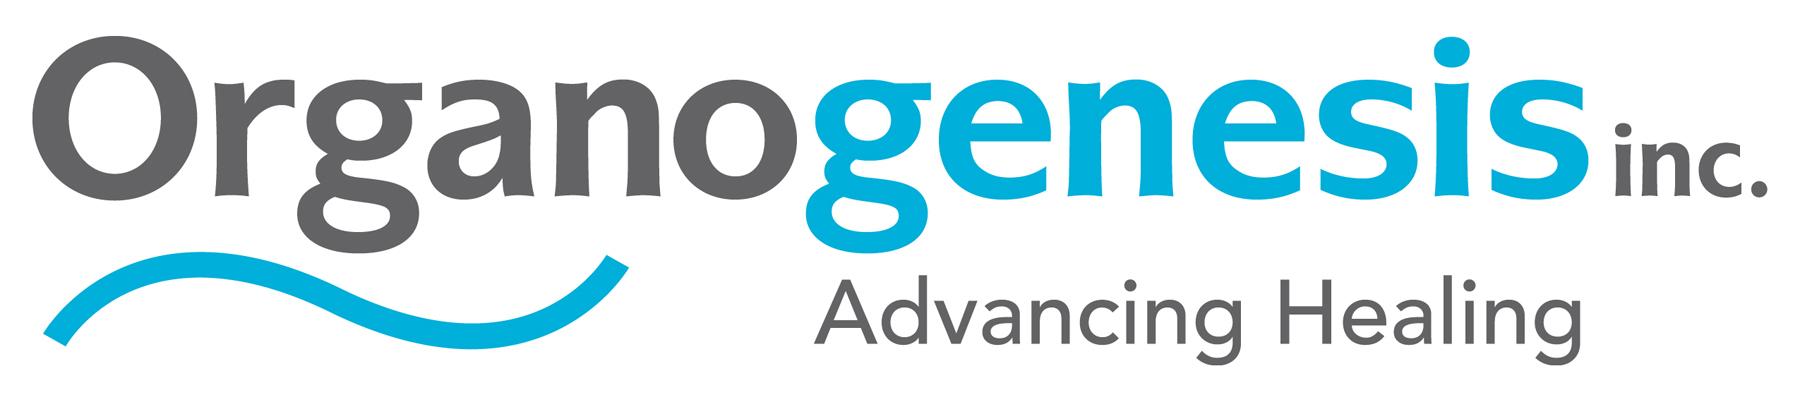 Organogenesis_Gold